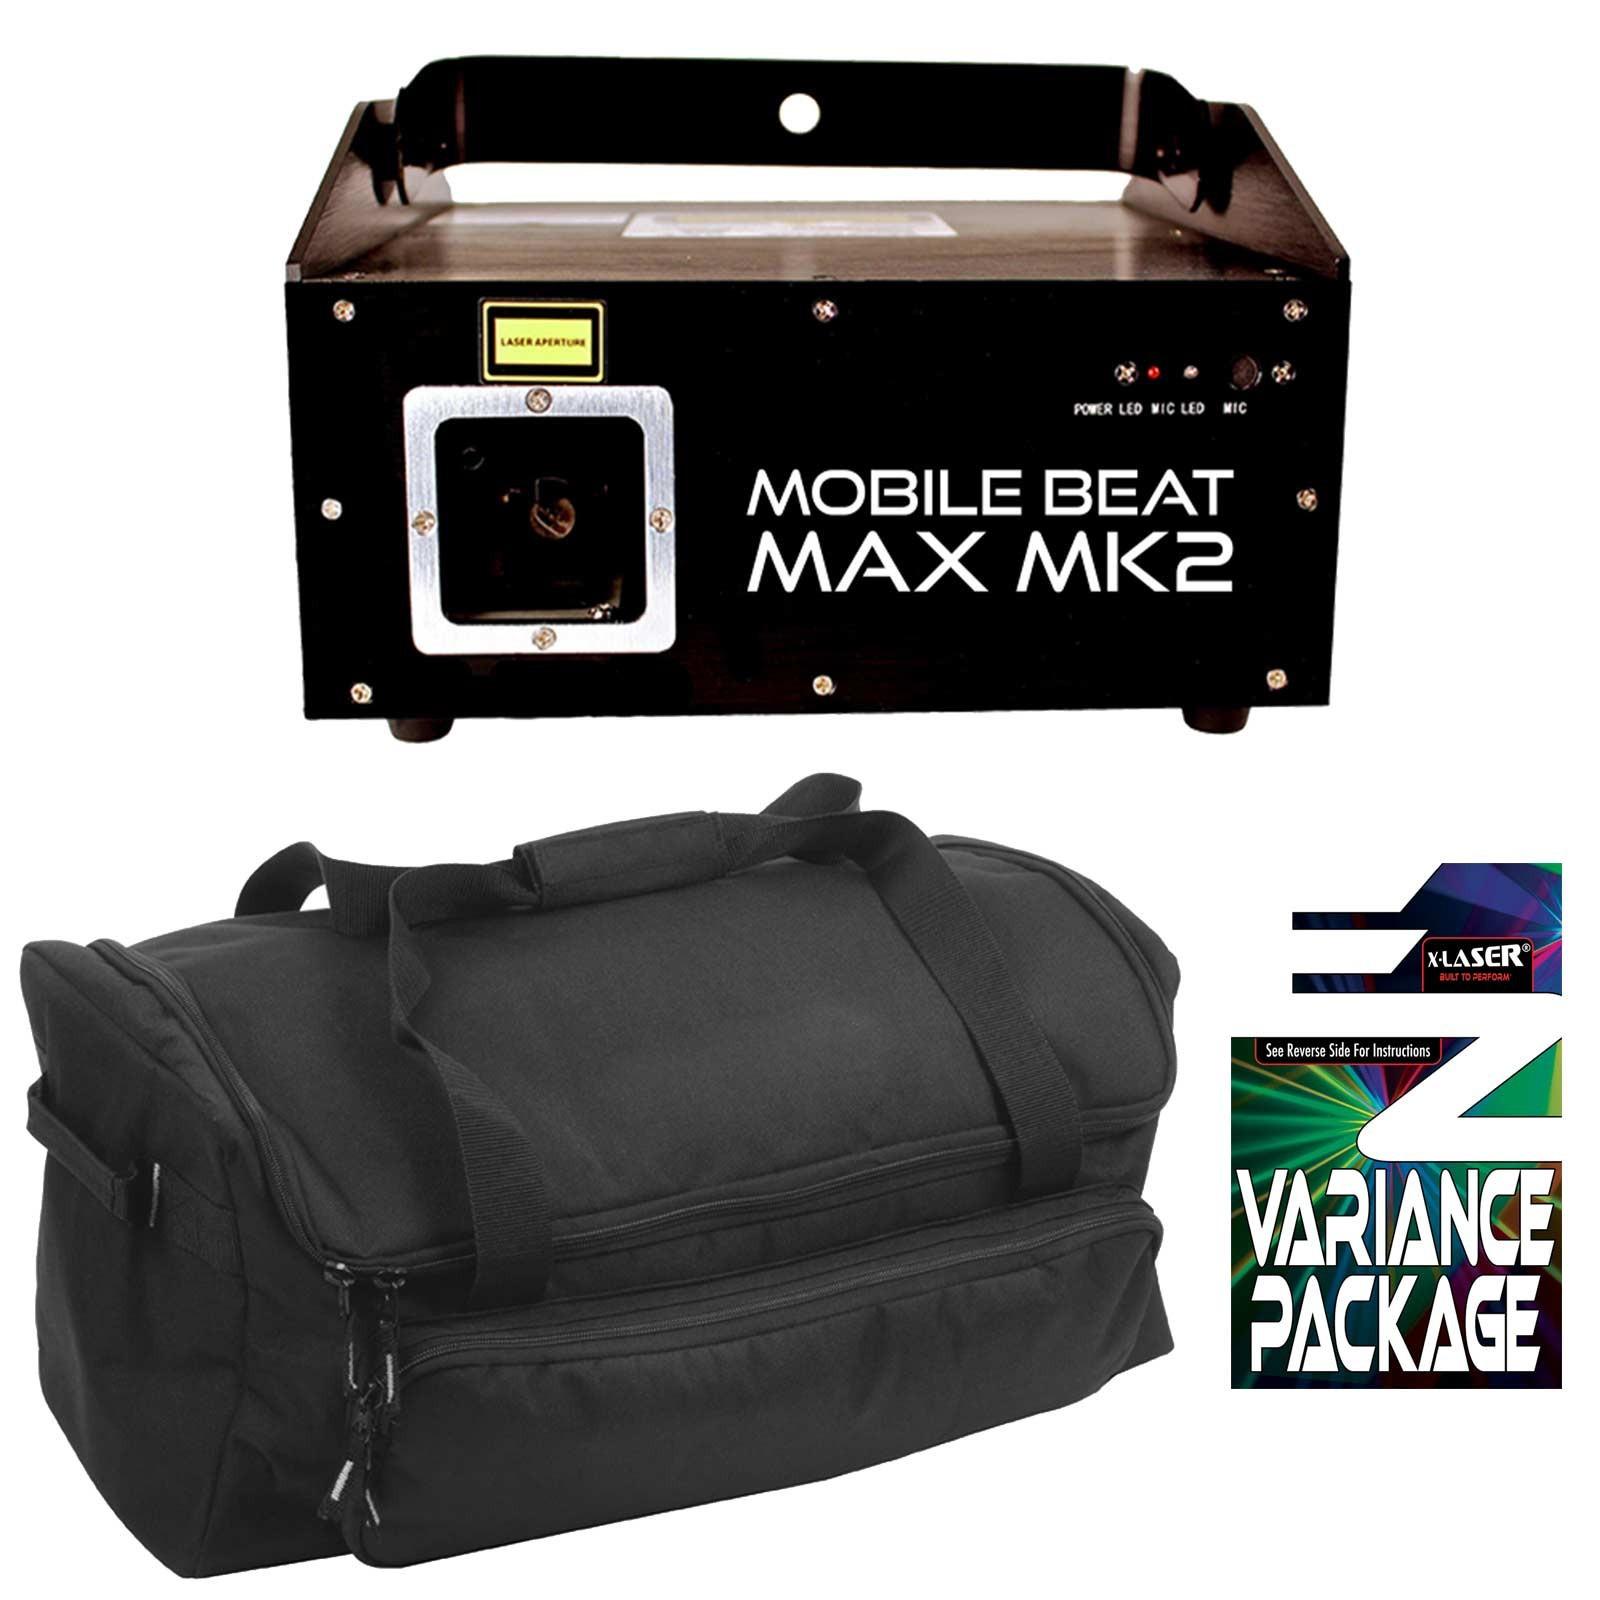 x-laser-mobile-beat-max-mk2-aerial-effect-laser-package-0a7.jpg